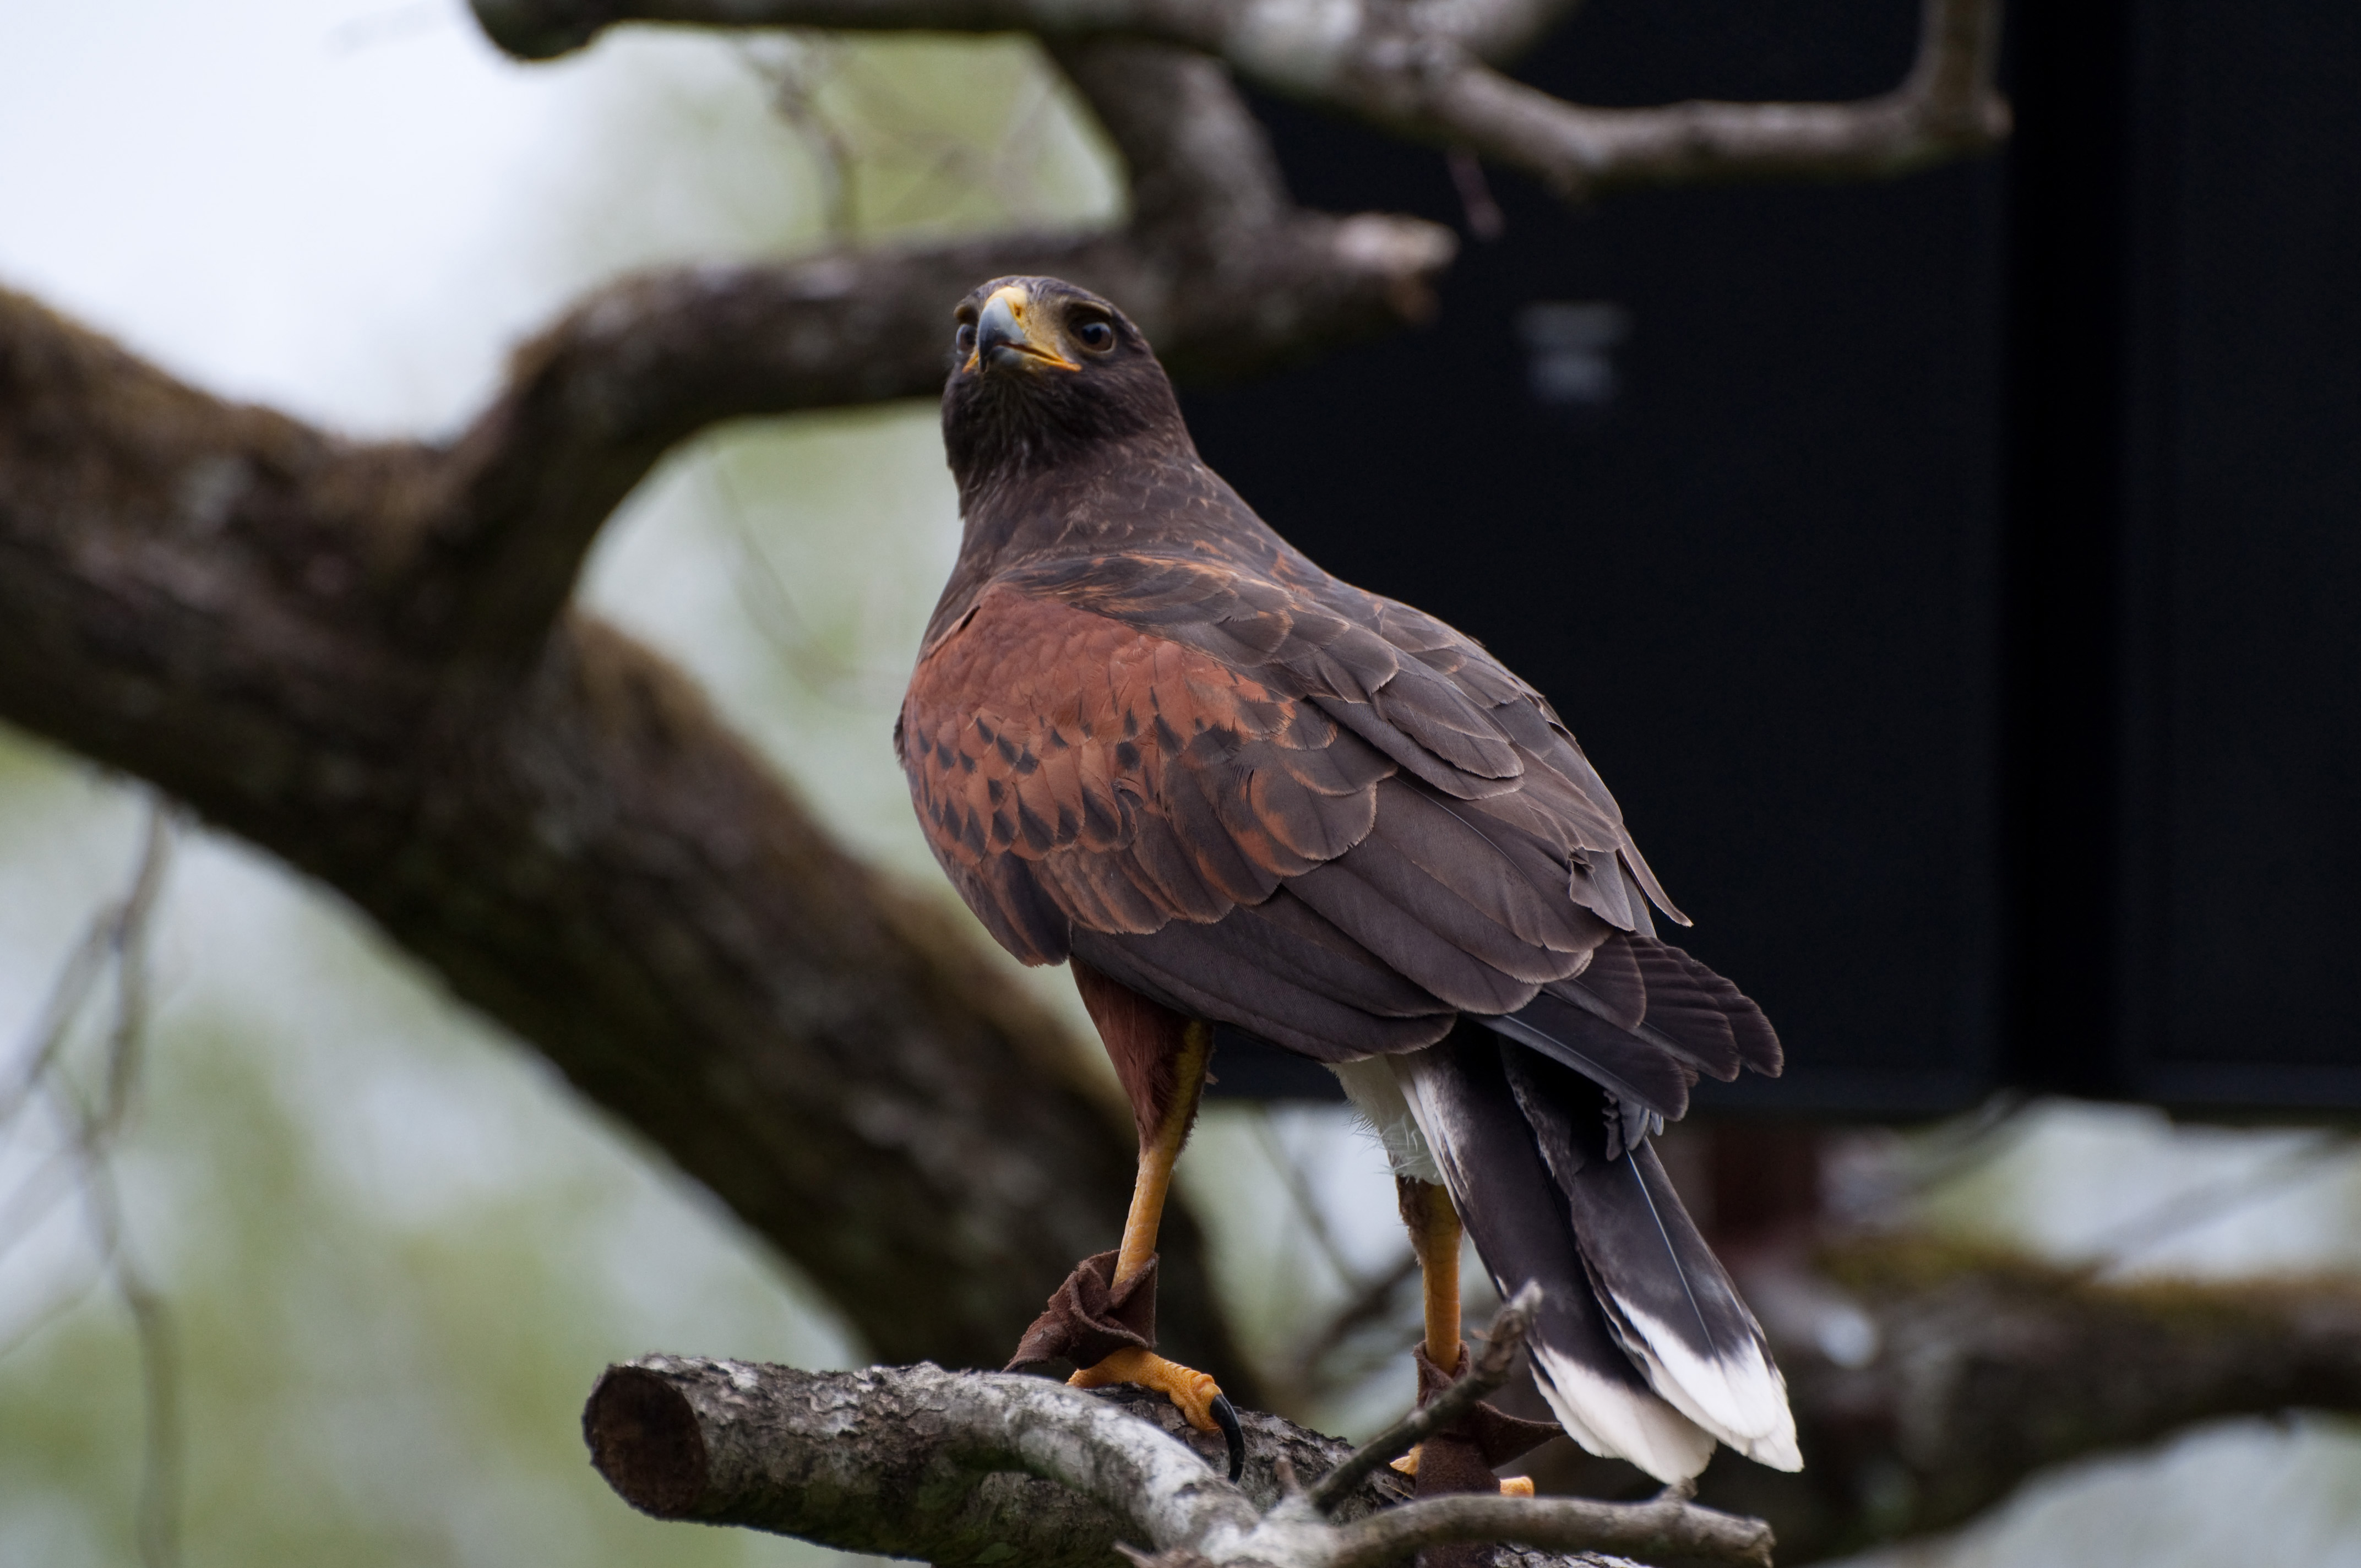 100875 download wallpaper Animals, Hawk, Bird, Predator, Brown, Wildlife screensavers and pictures for free